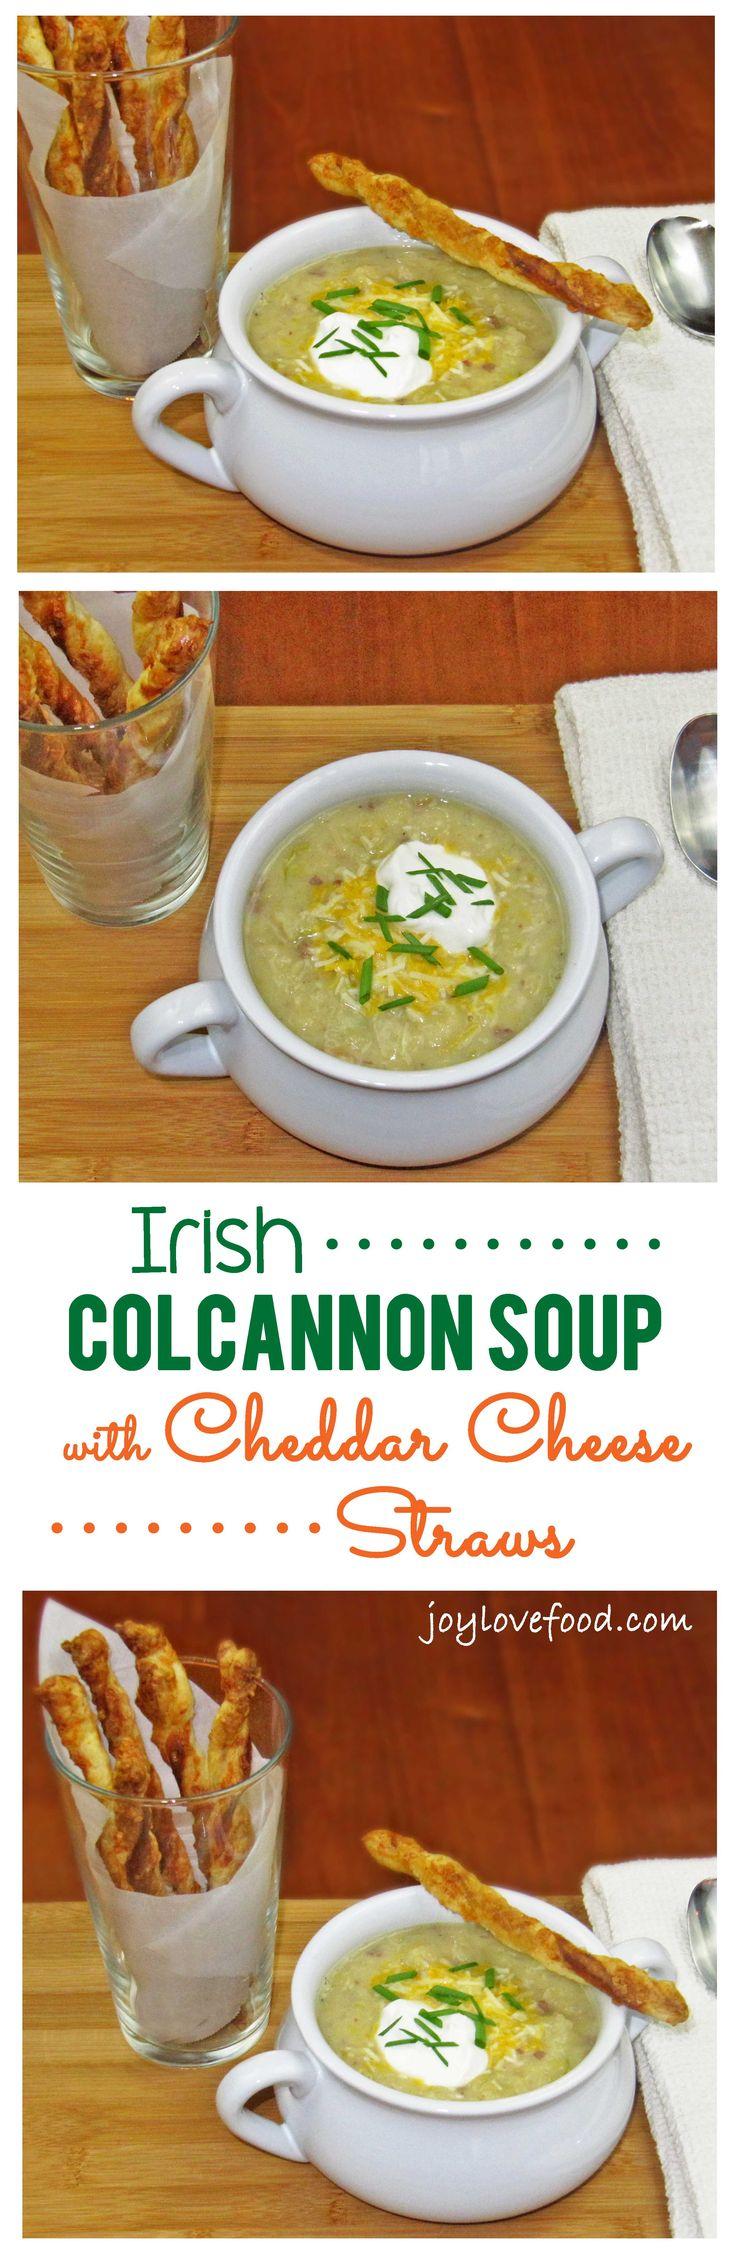 Irish Colcannon Soup with Cheddar Cheese Straws Recipe